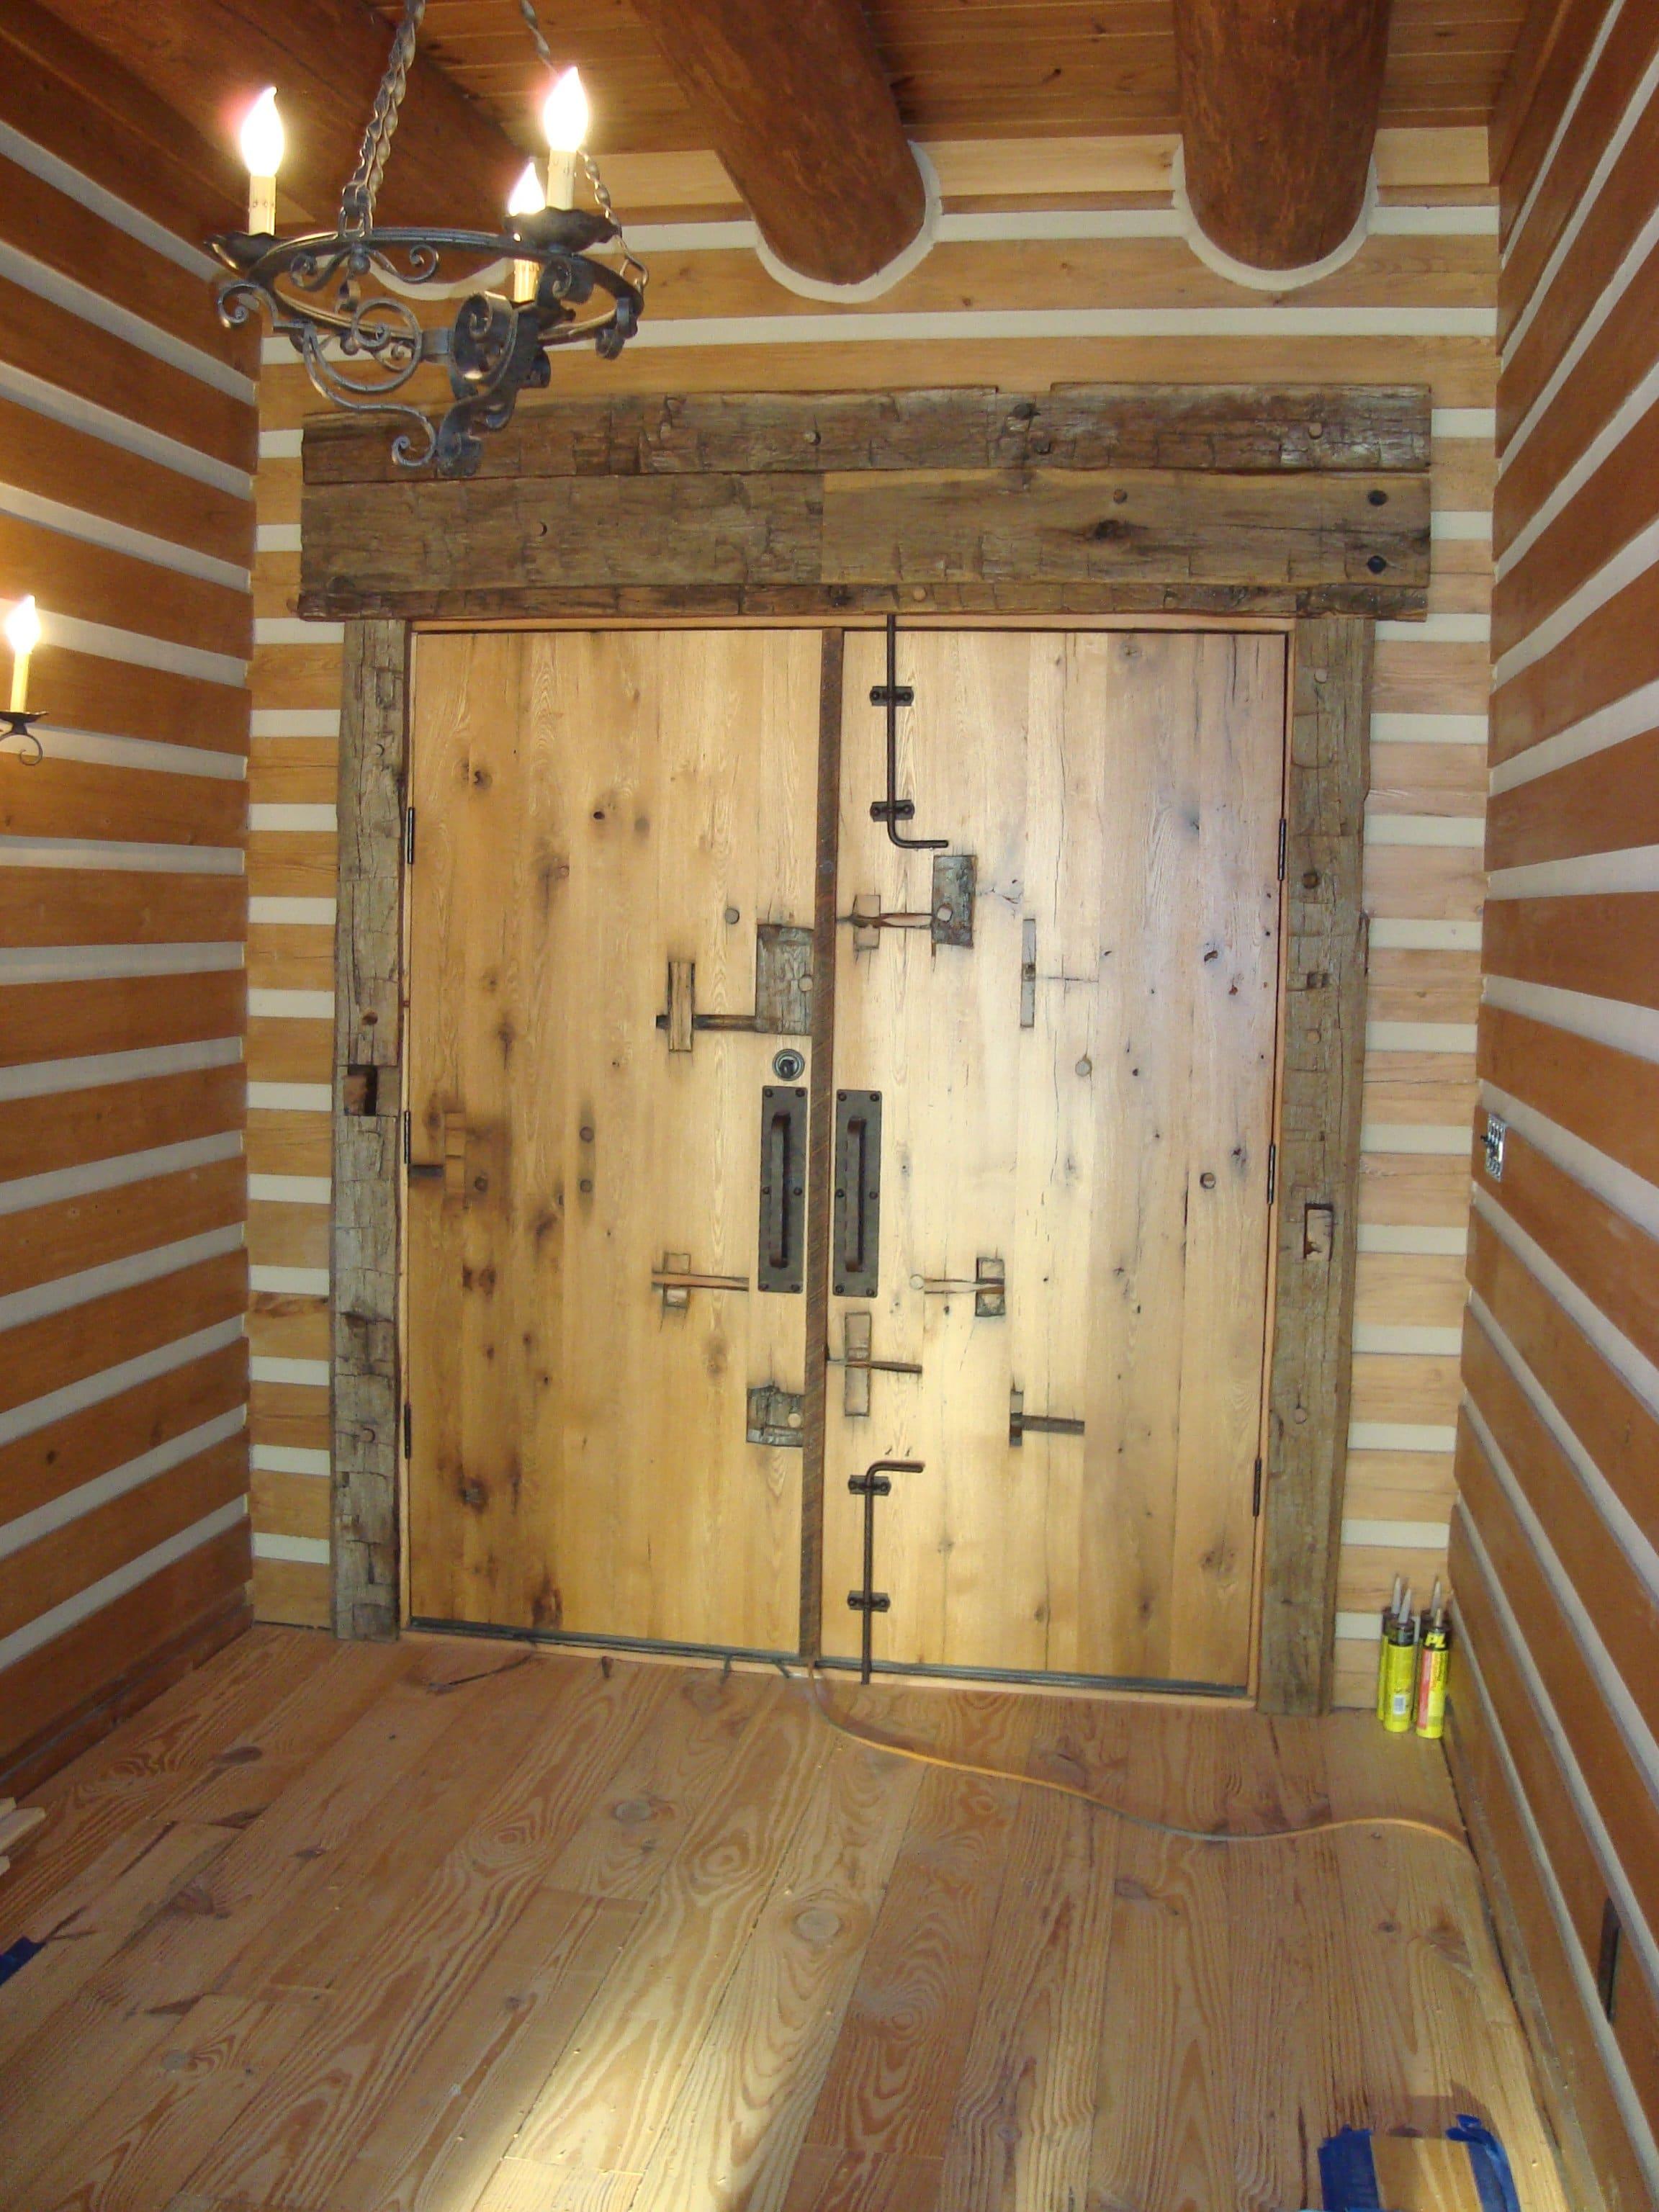 Derang Old Barn Wood Craft Ideas